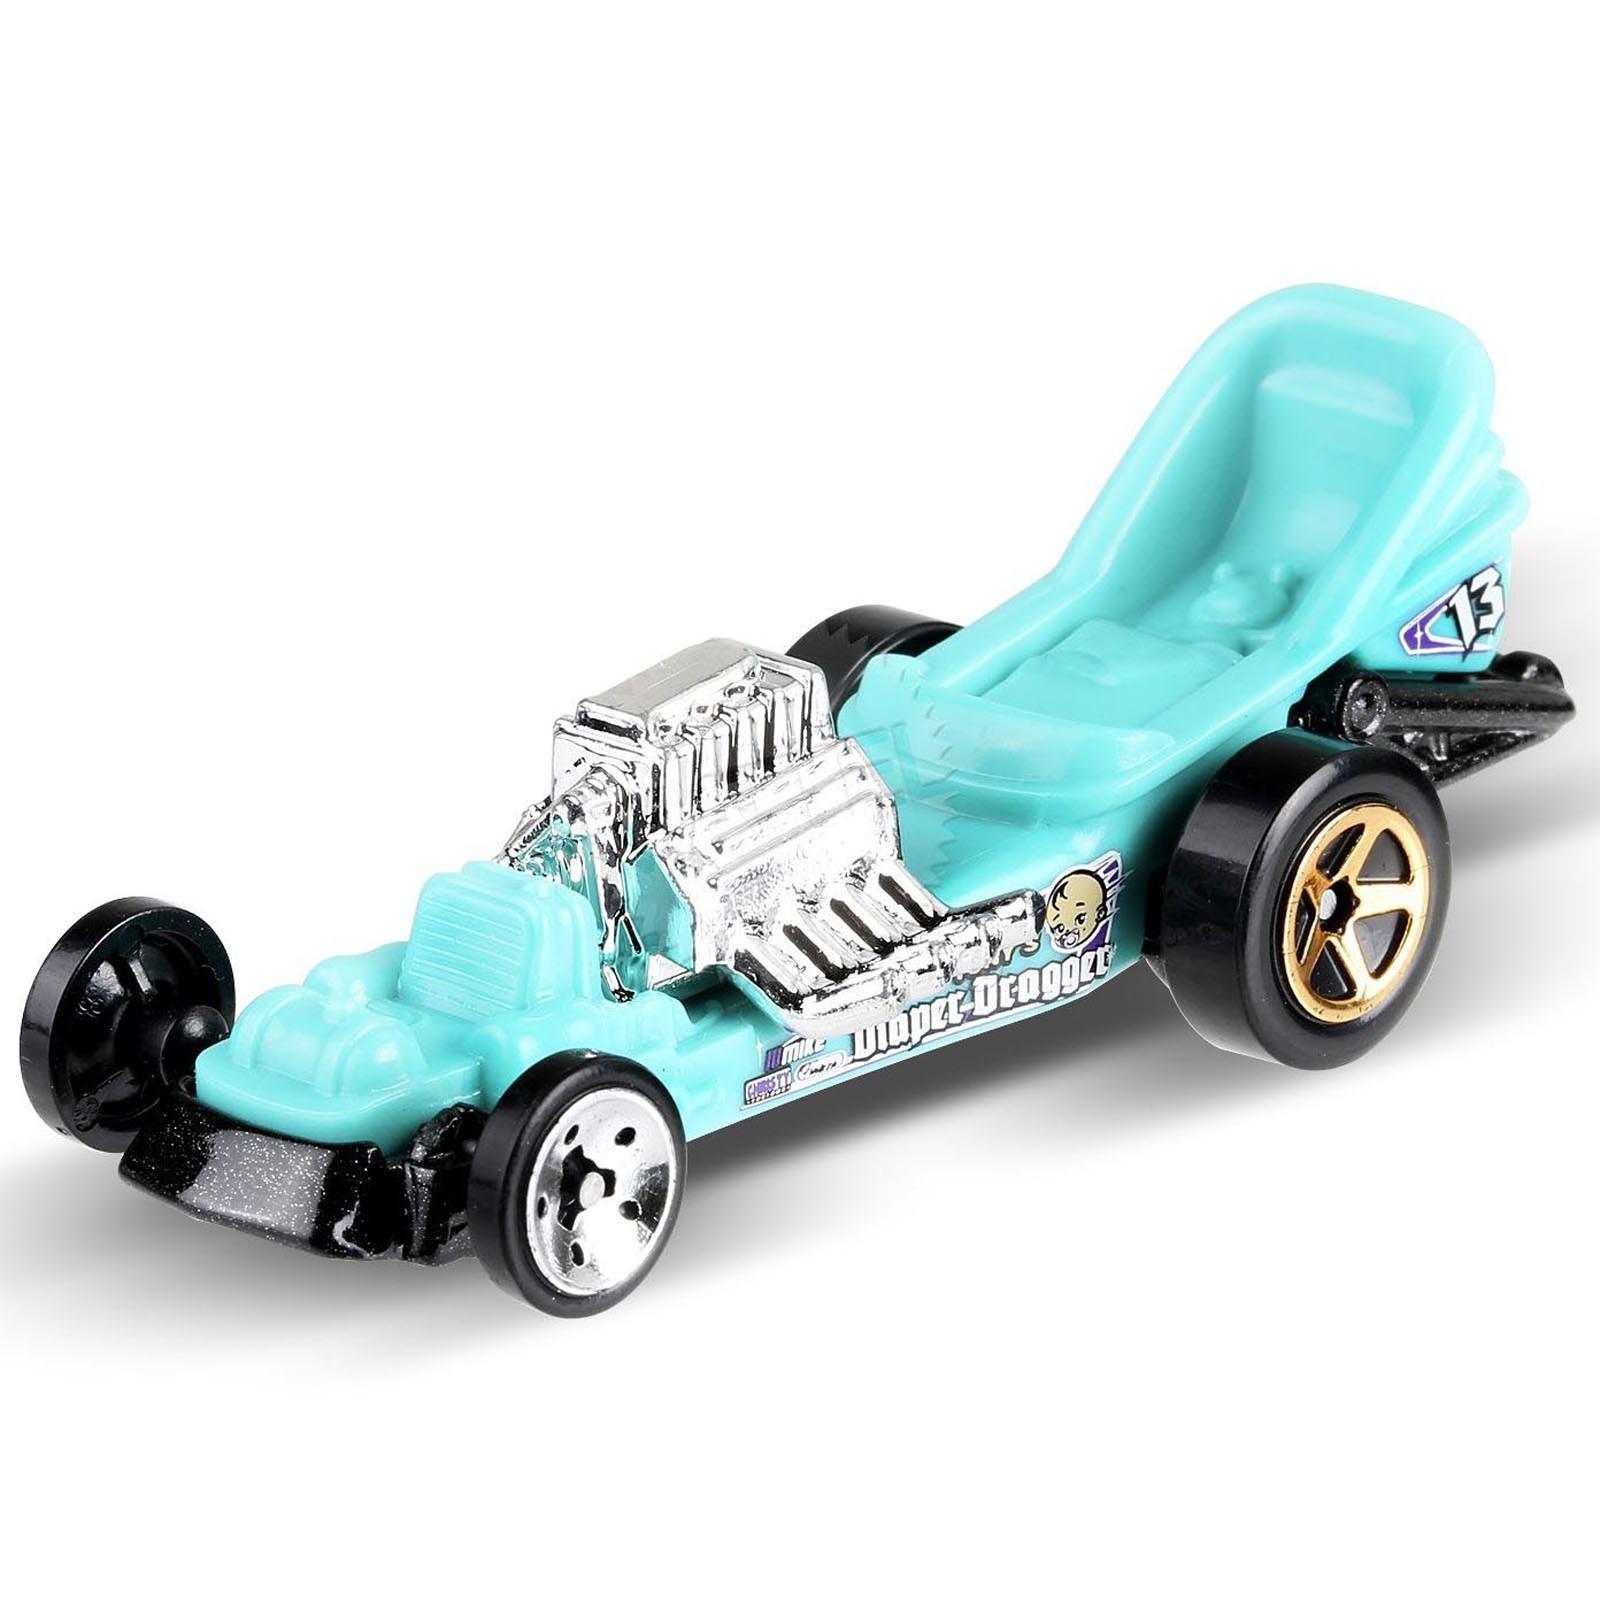 Hot Wheels - Diaper Dragger™ - FYF55